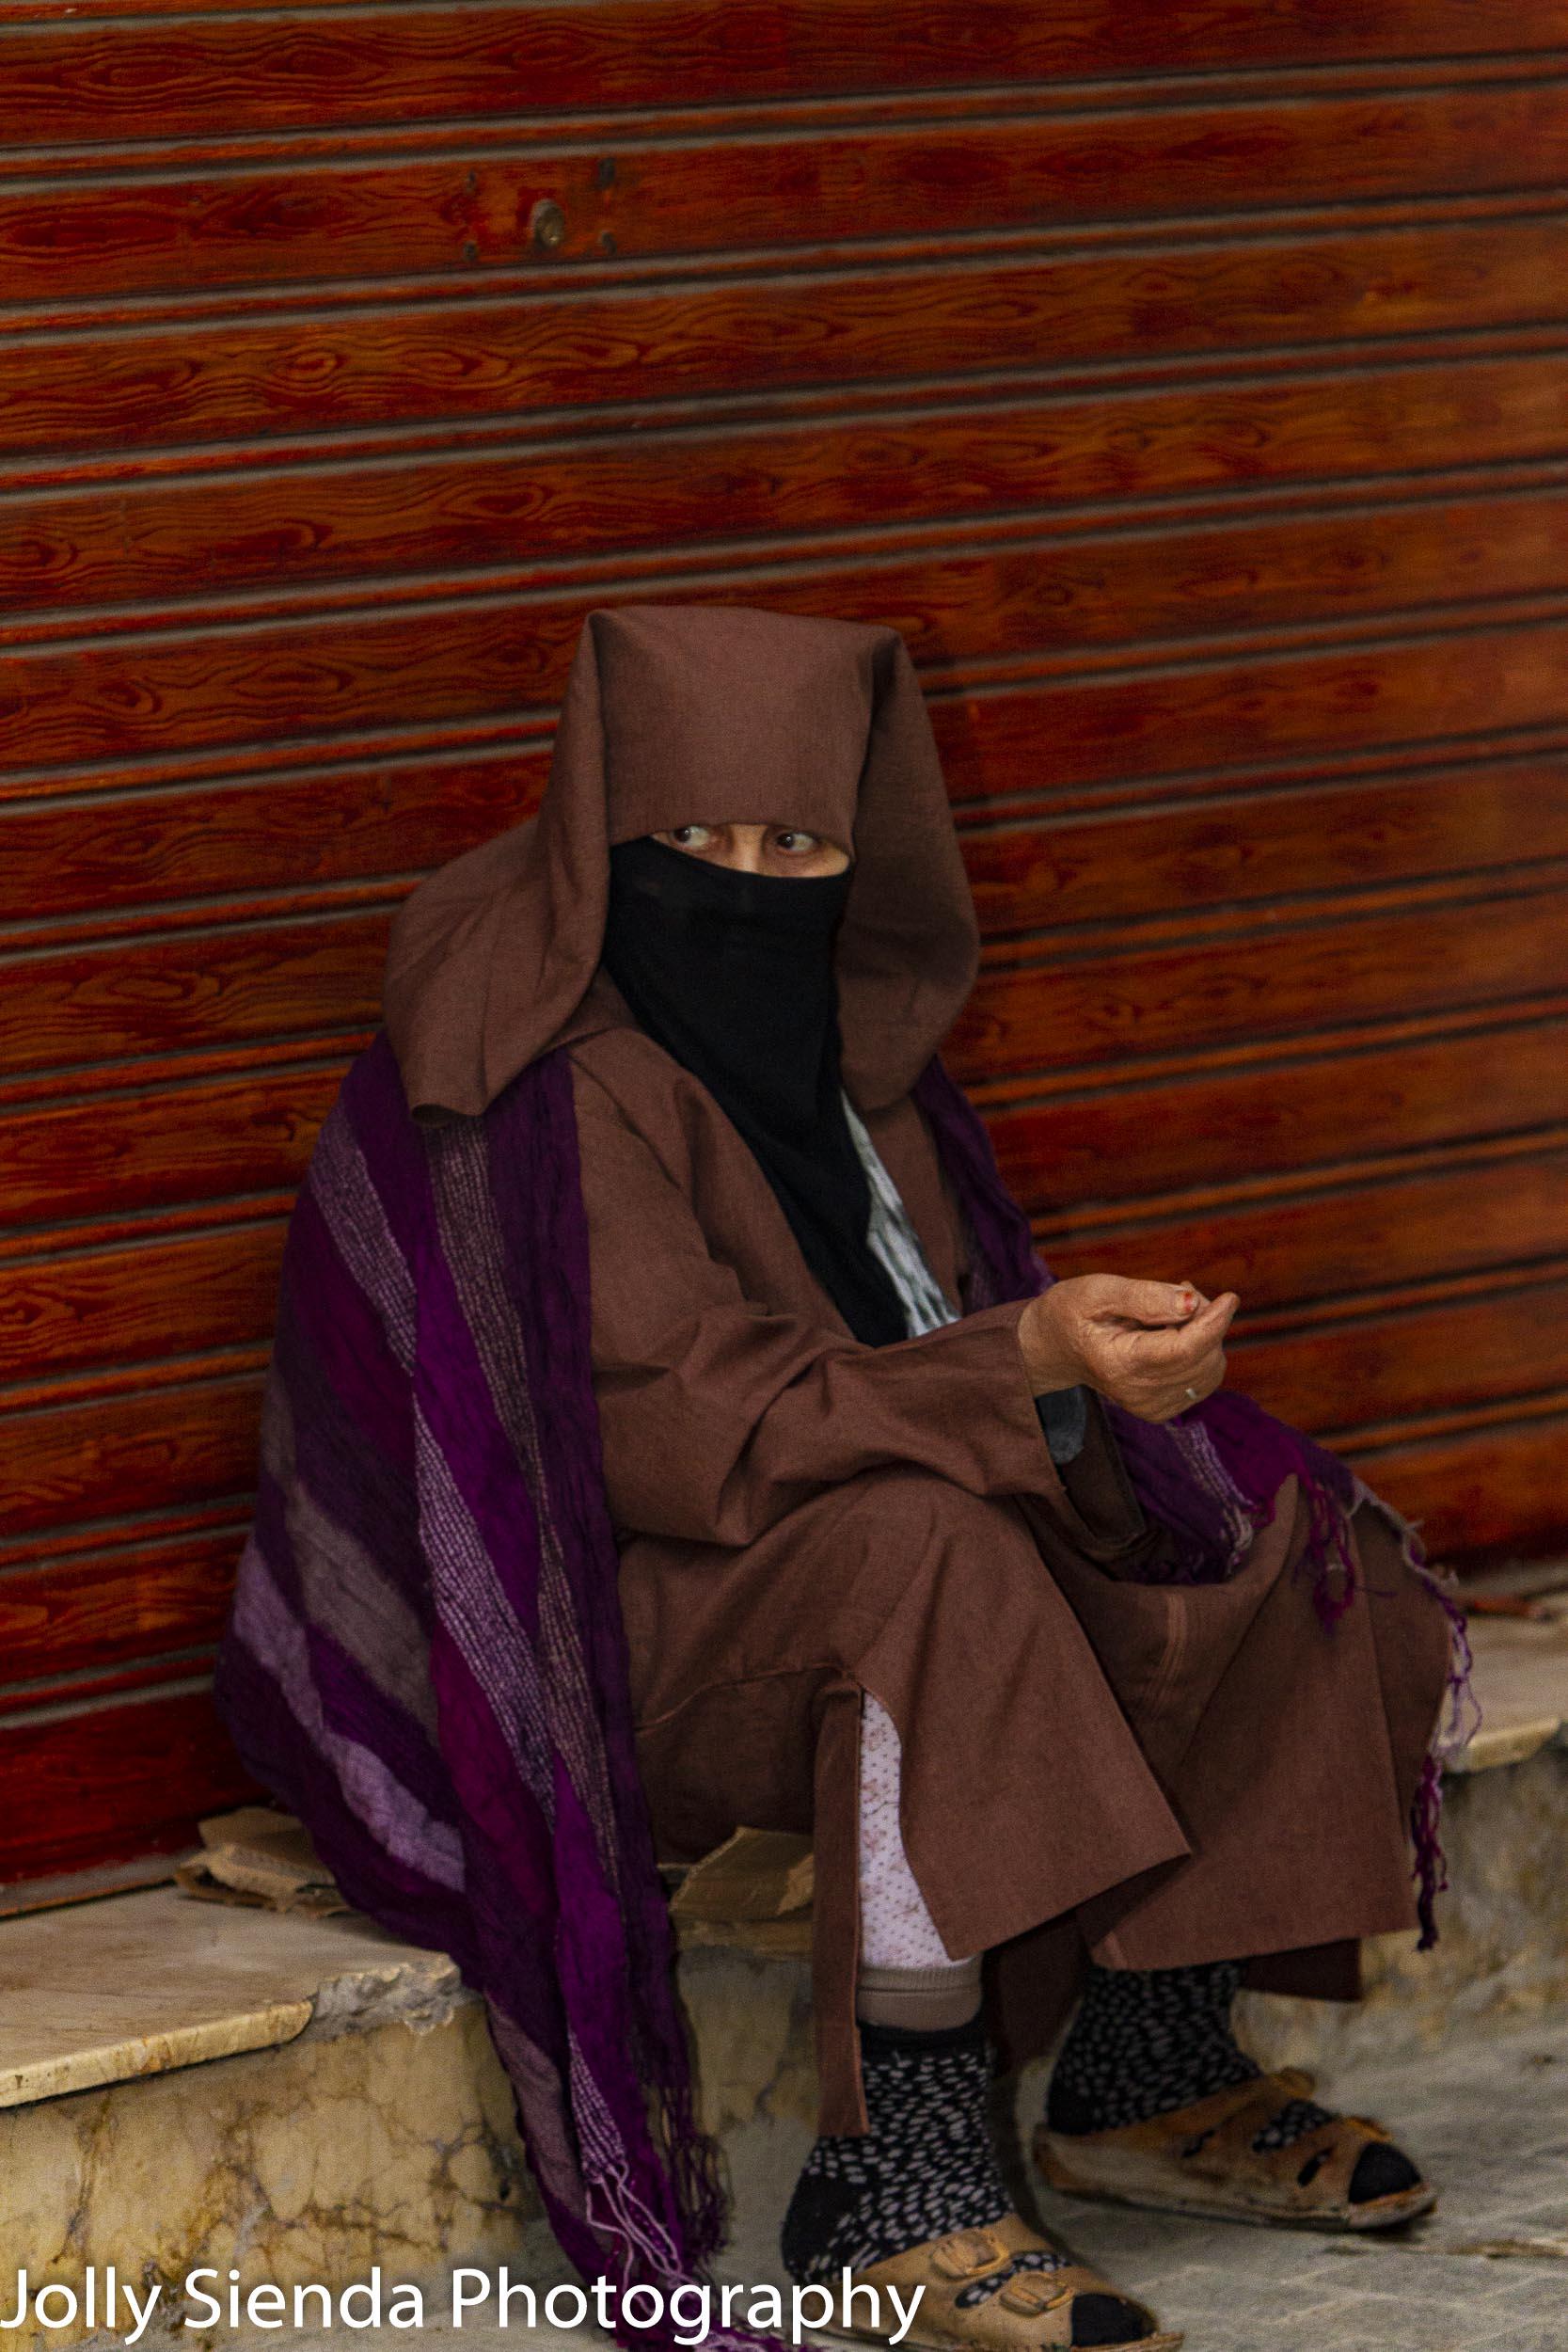 Portrait of a woman wearing a jabala